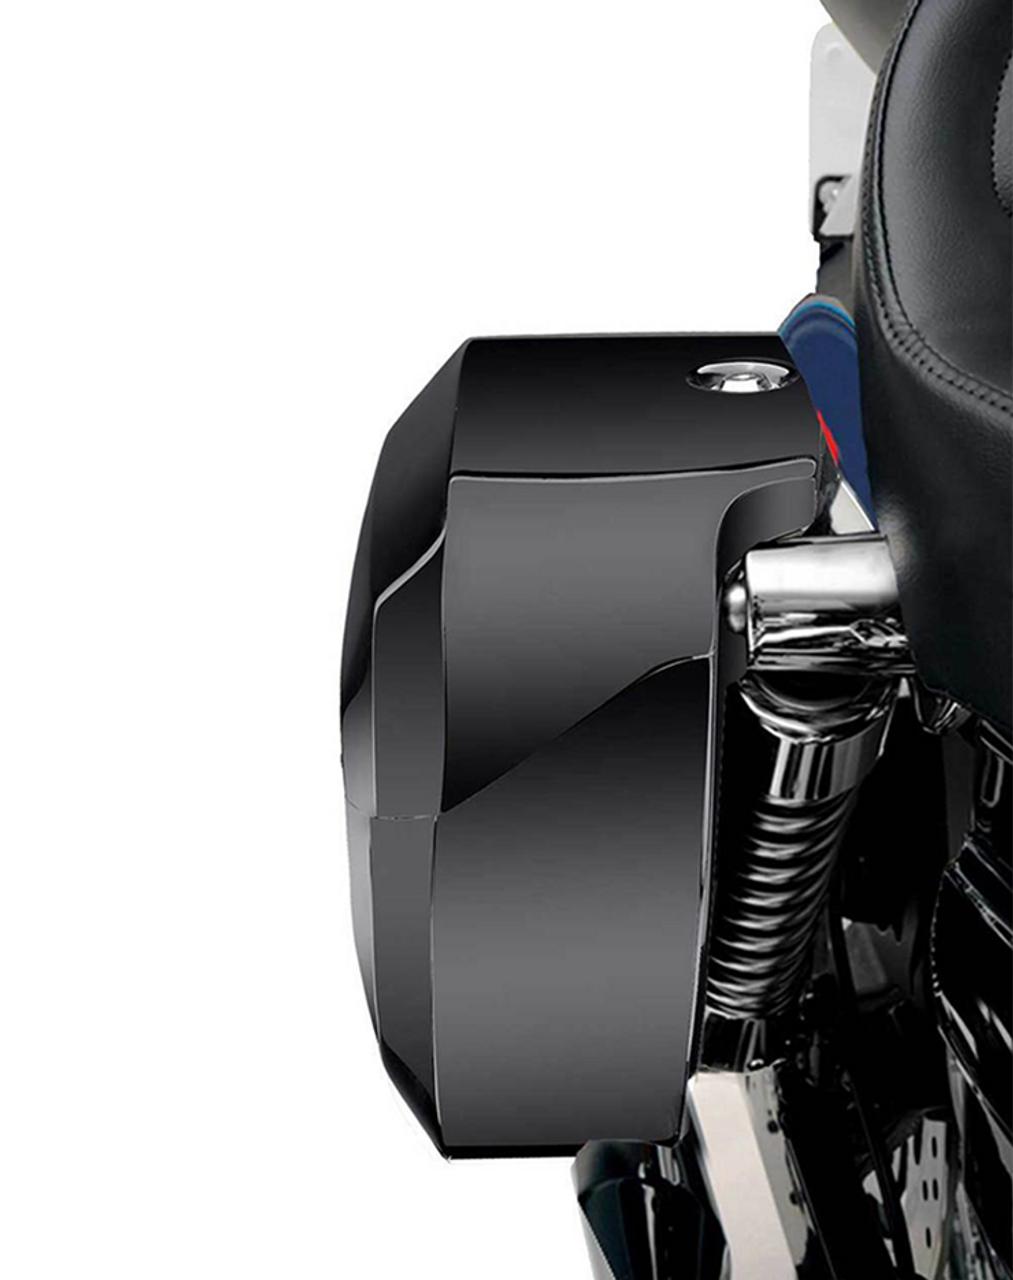 Kawasaki Vulcan 1500 Classic, VN1500 Lamellar Extra Large Shock Cutout Saddlebag Shock Cutout View